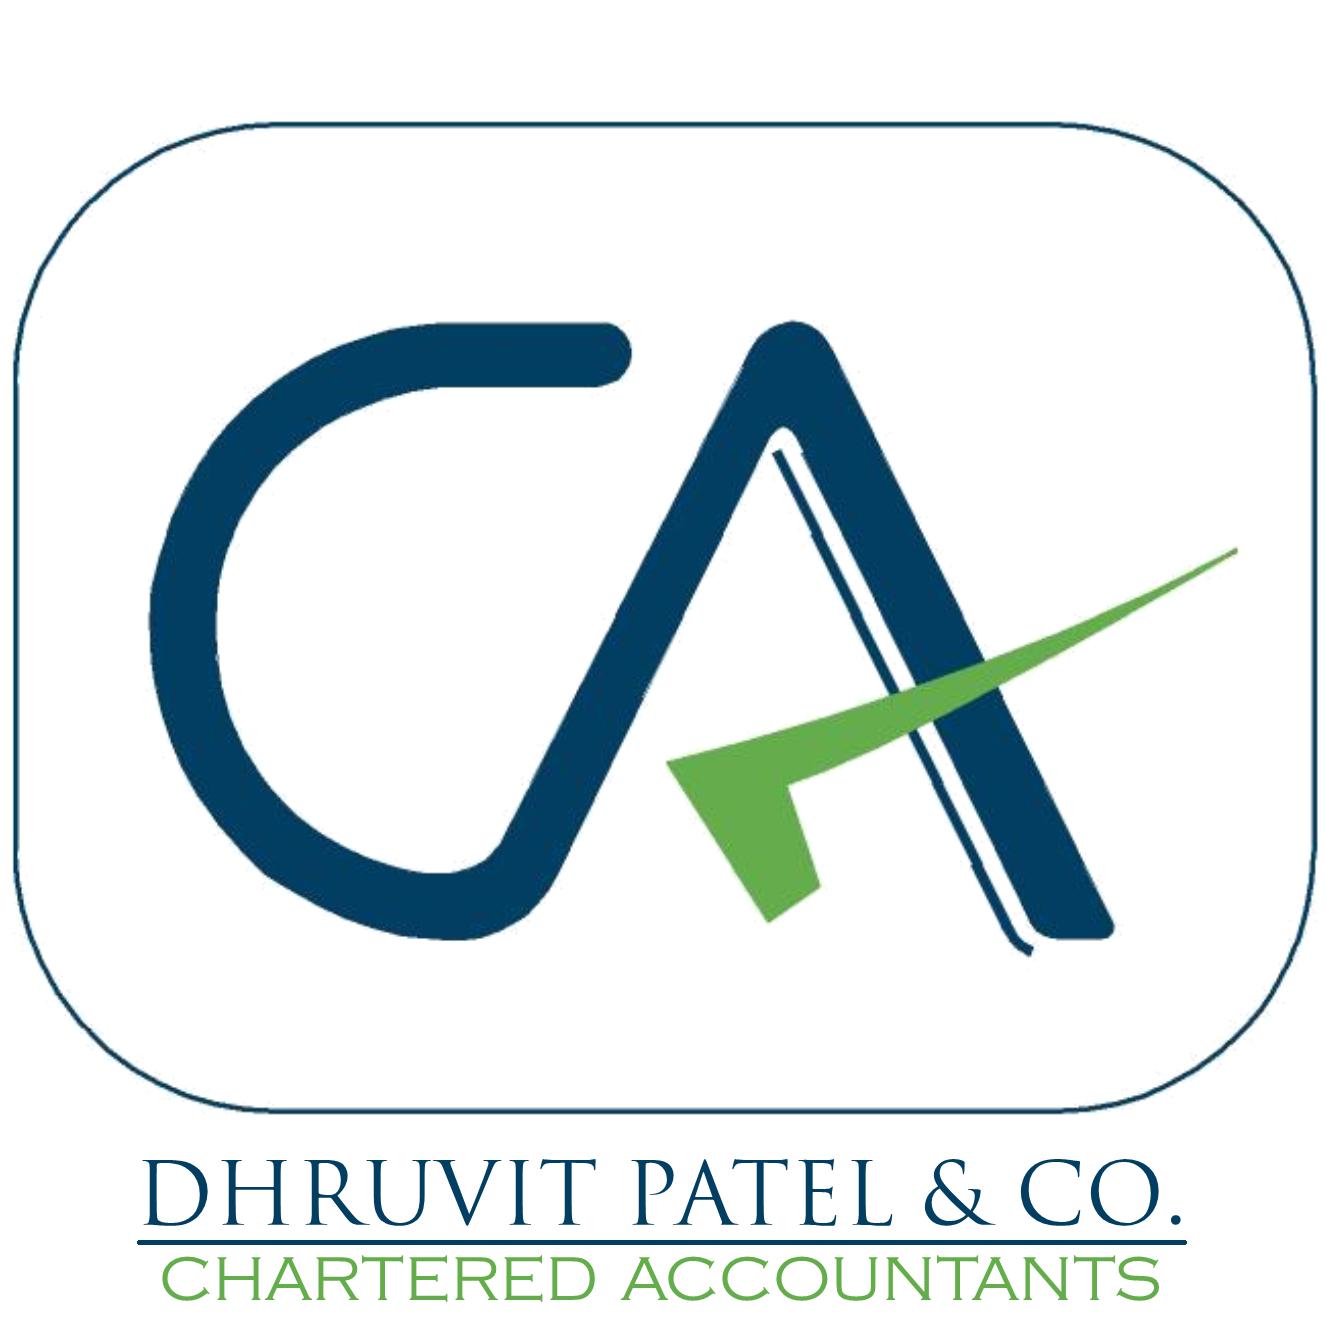 Dhruvit Patel & Co. Logo